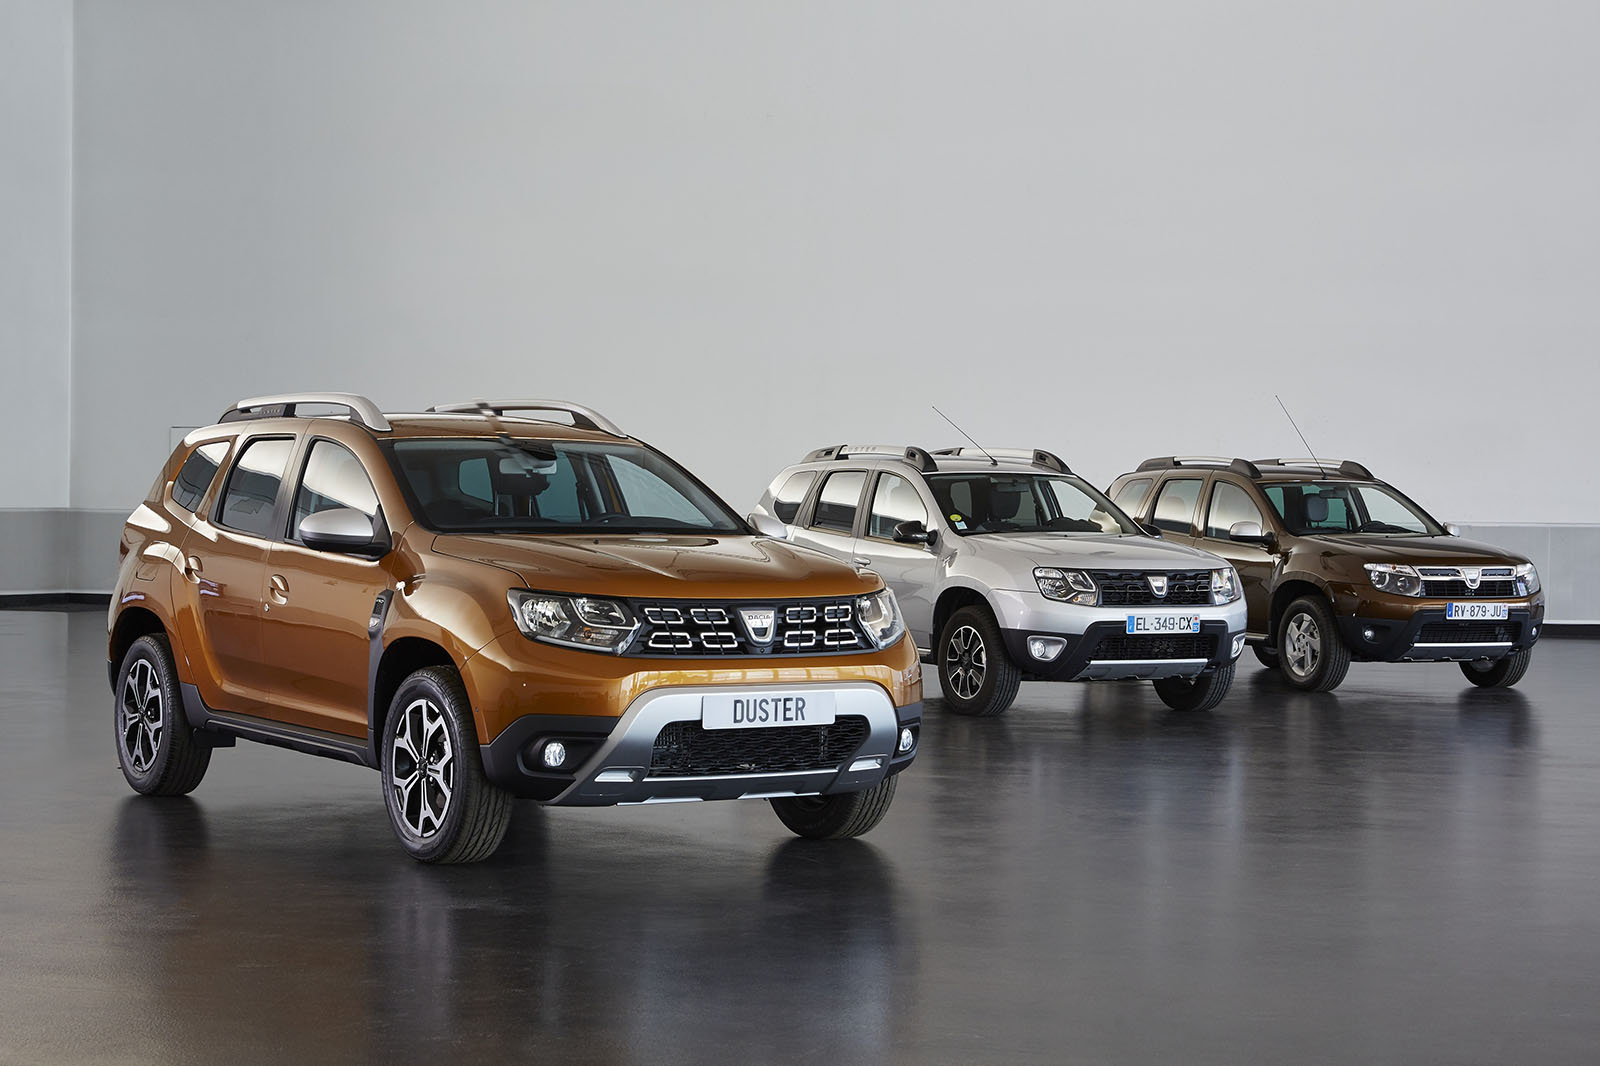 new dacia duster tce turbo petrol variants now on sale autocar